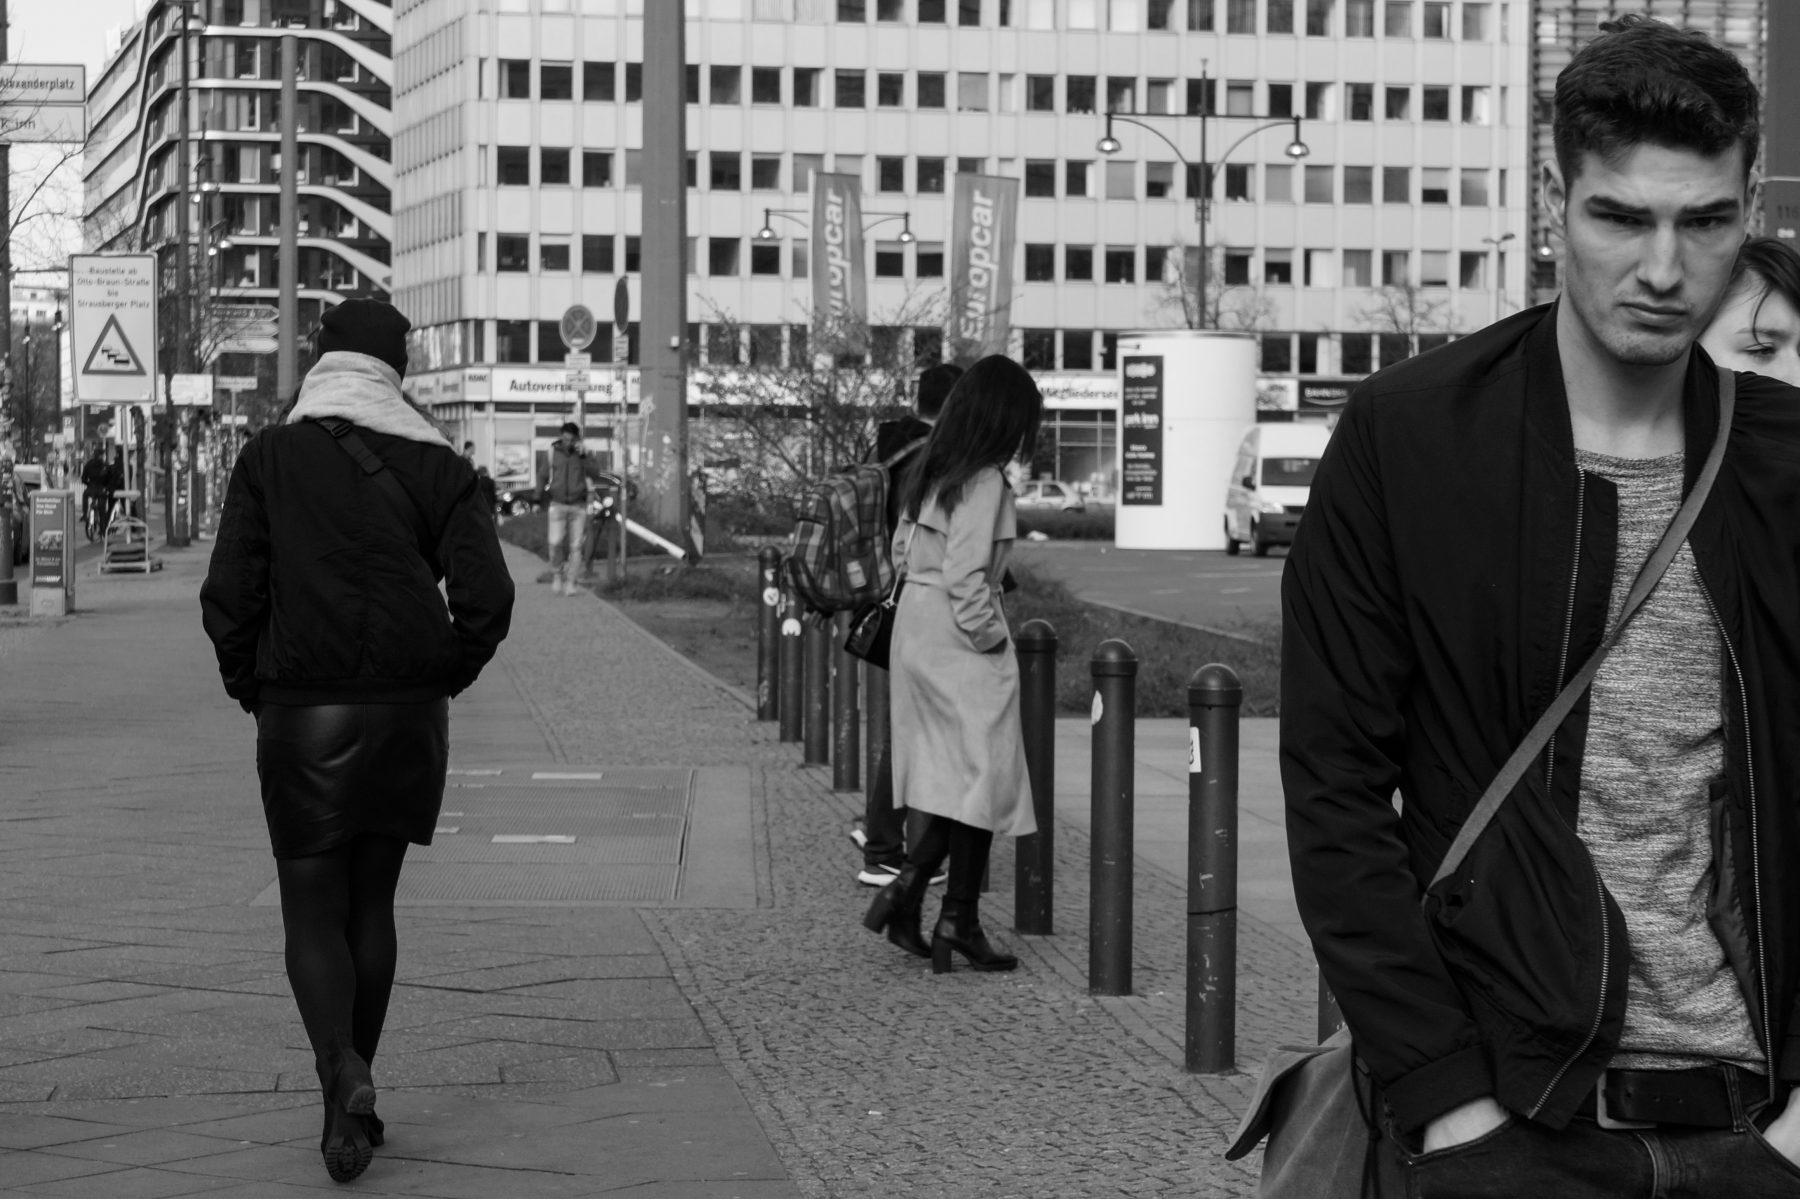 Alexanderplatz, March 2019